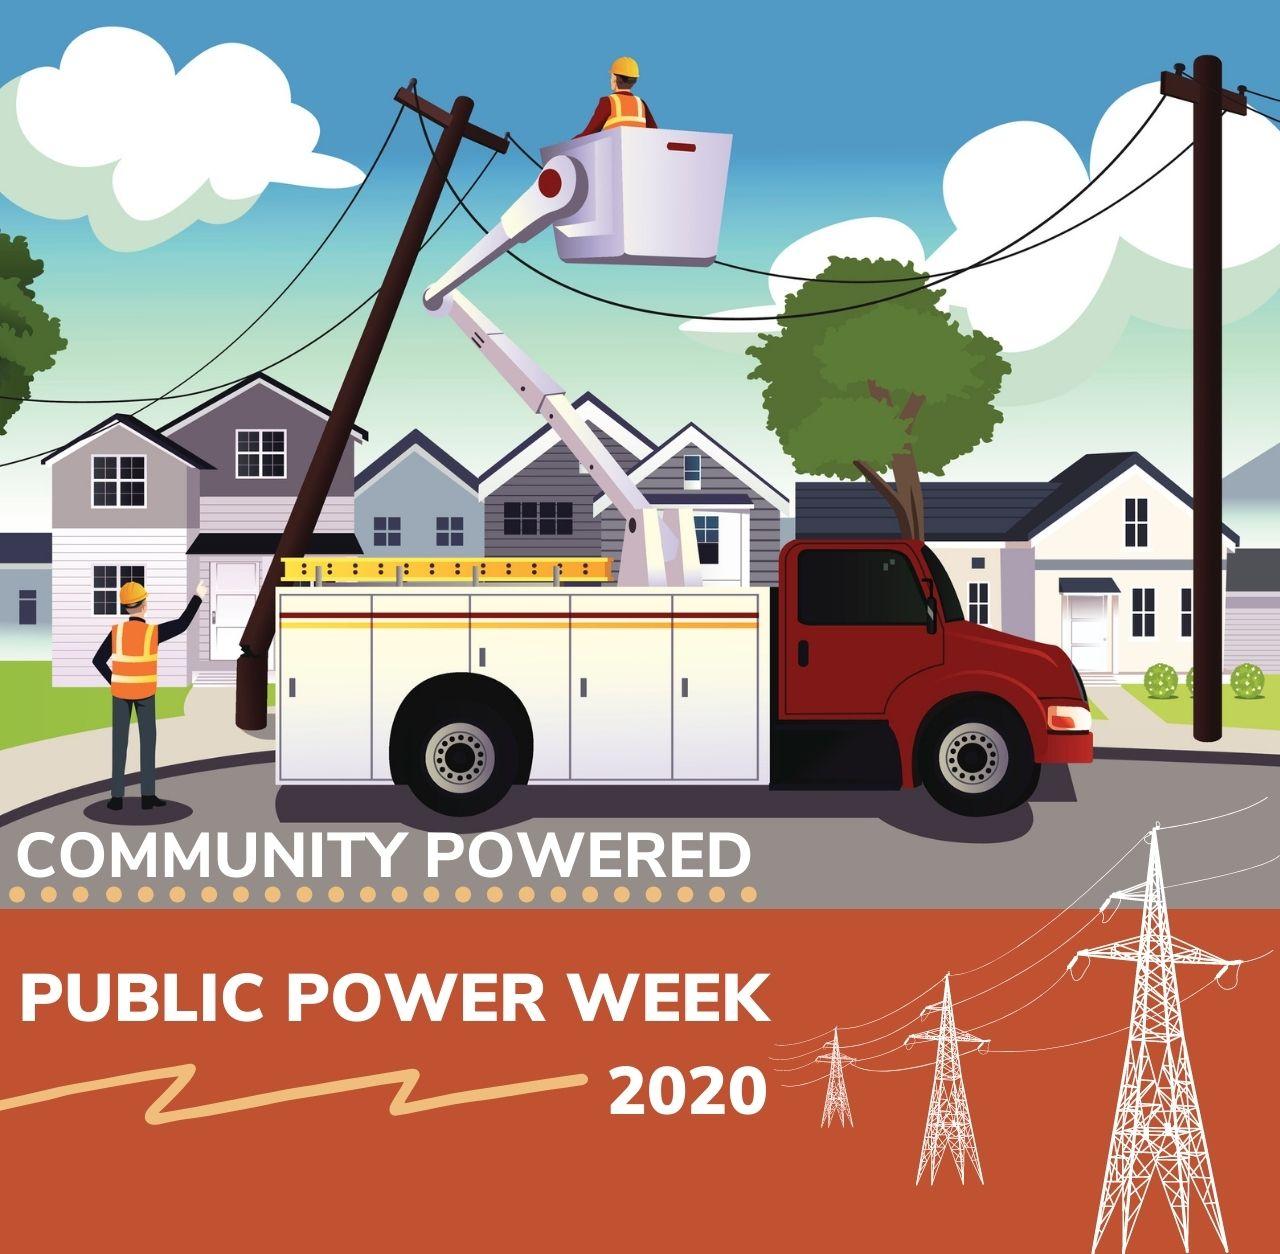 Community Powered 2019 Public Power Week